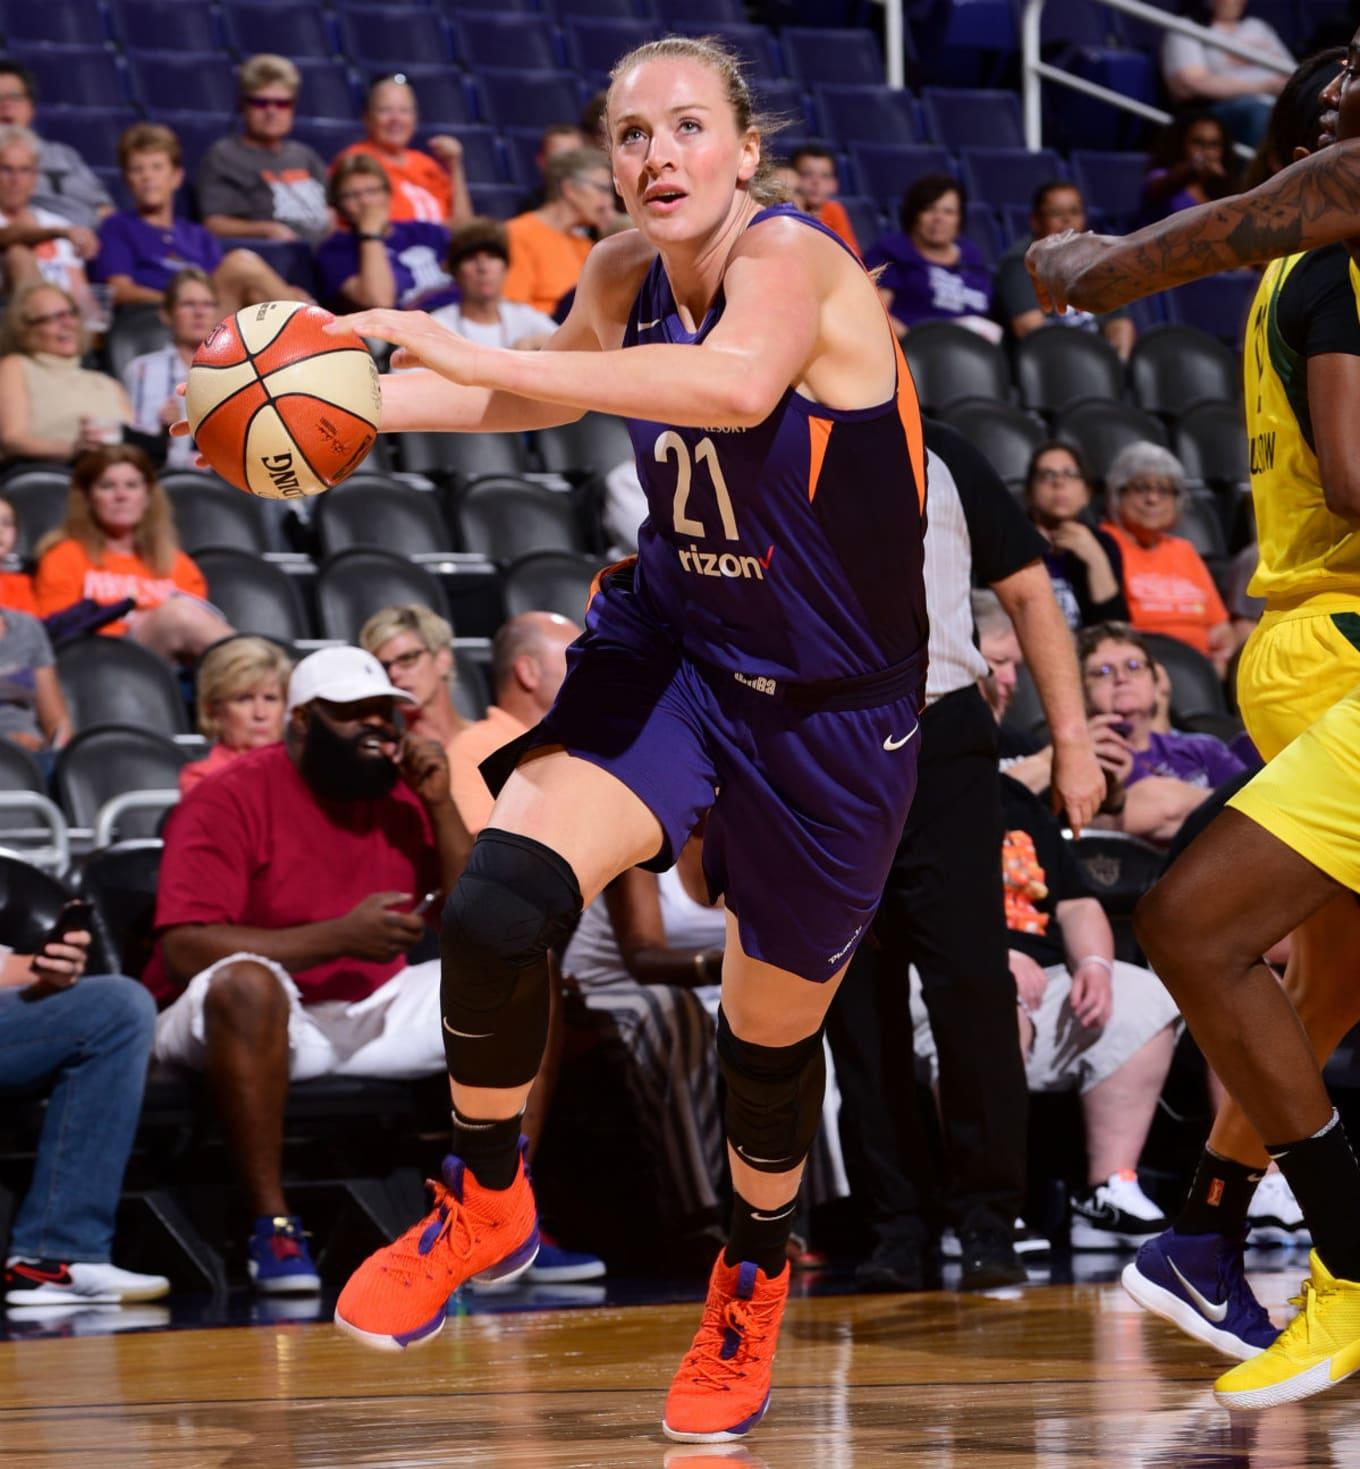 5499b7fa14c47 #SoleWatch: WNBA Rookie Begins Career in Exclusive Nike LeBron 15